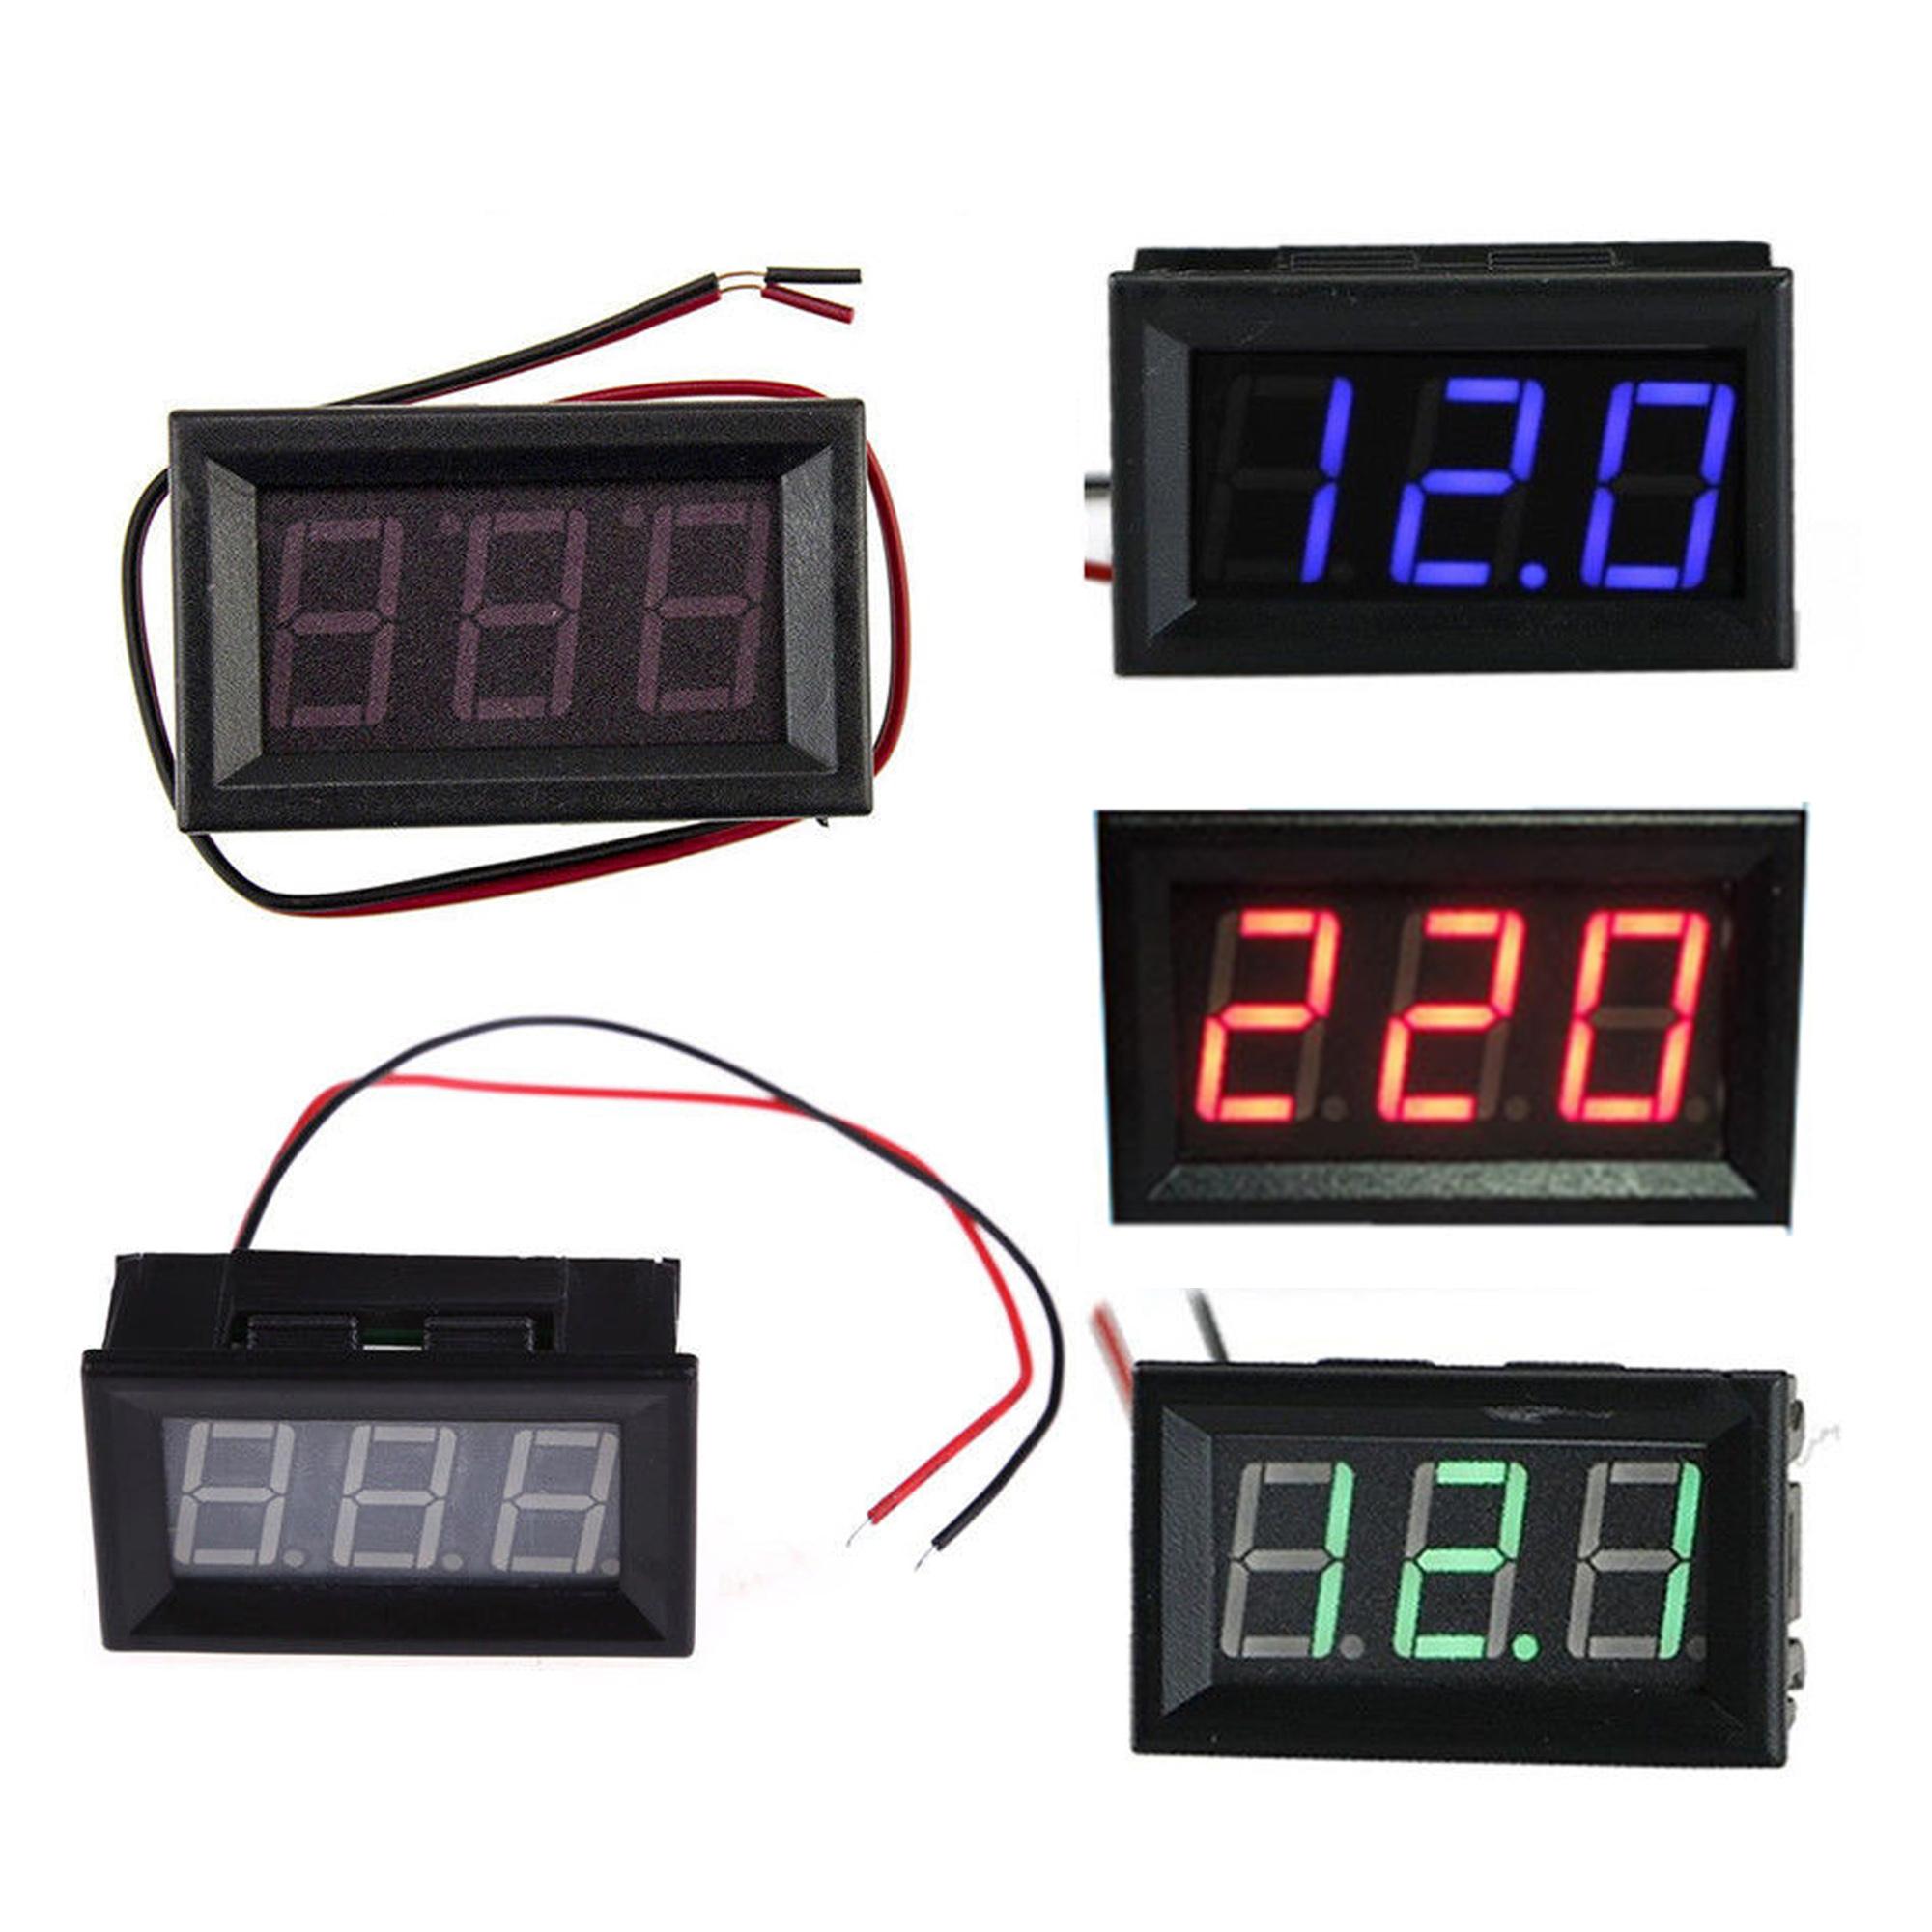 Green LED Panel Meter Digital Voltmeter DC 0V To 30V Three-wrie ASS